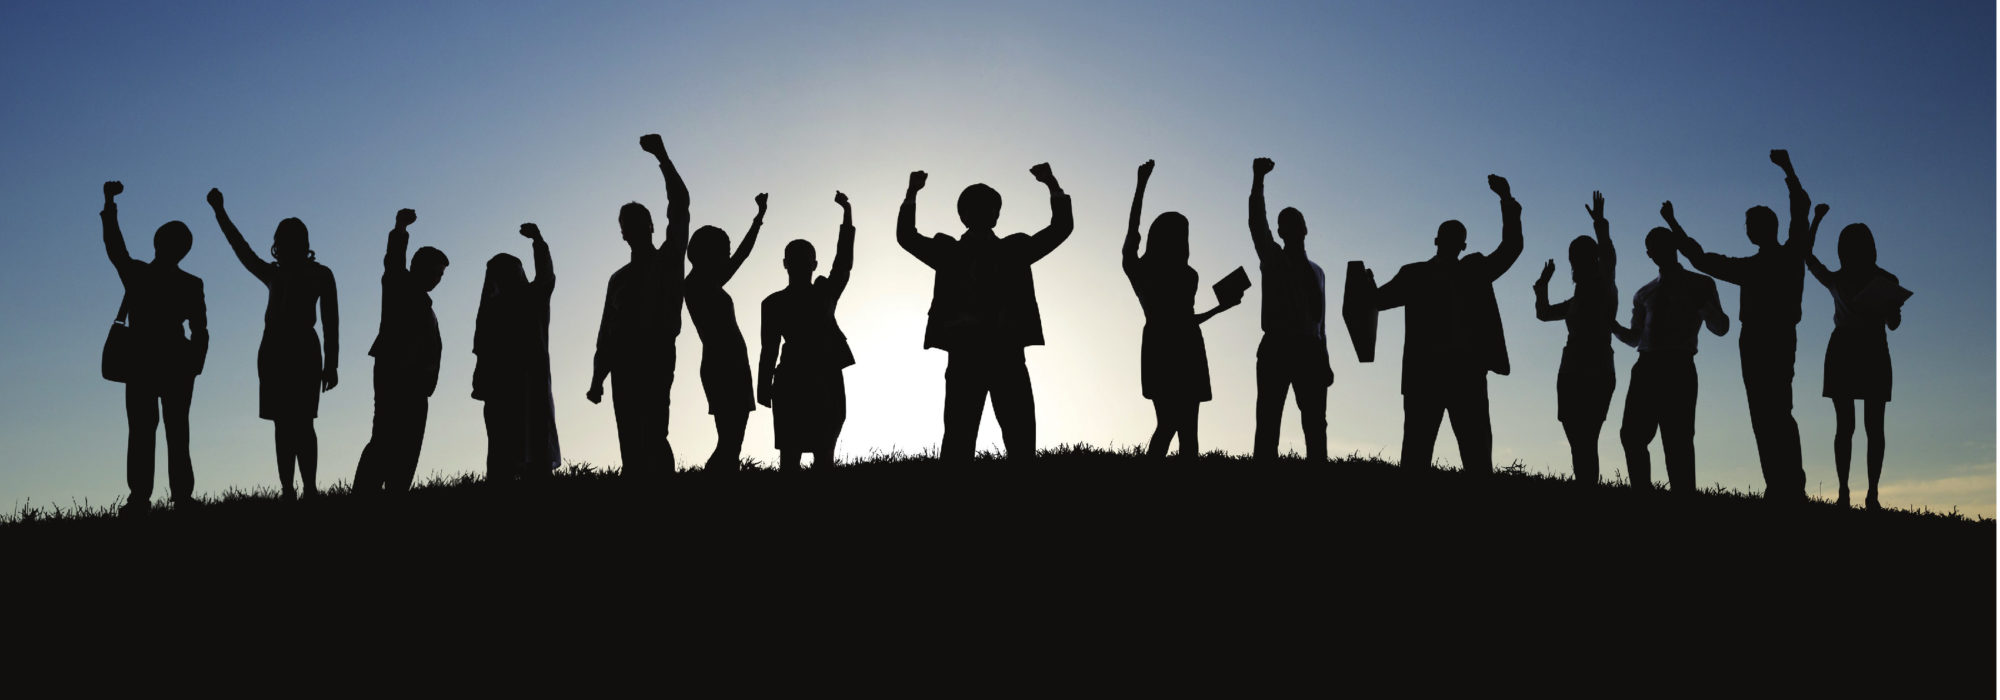 solidariteitsnetwerk solidarity network vloerwerk actie